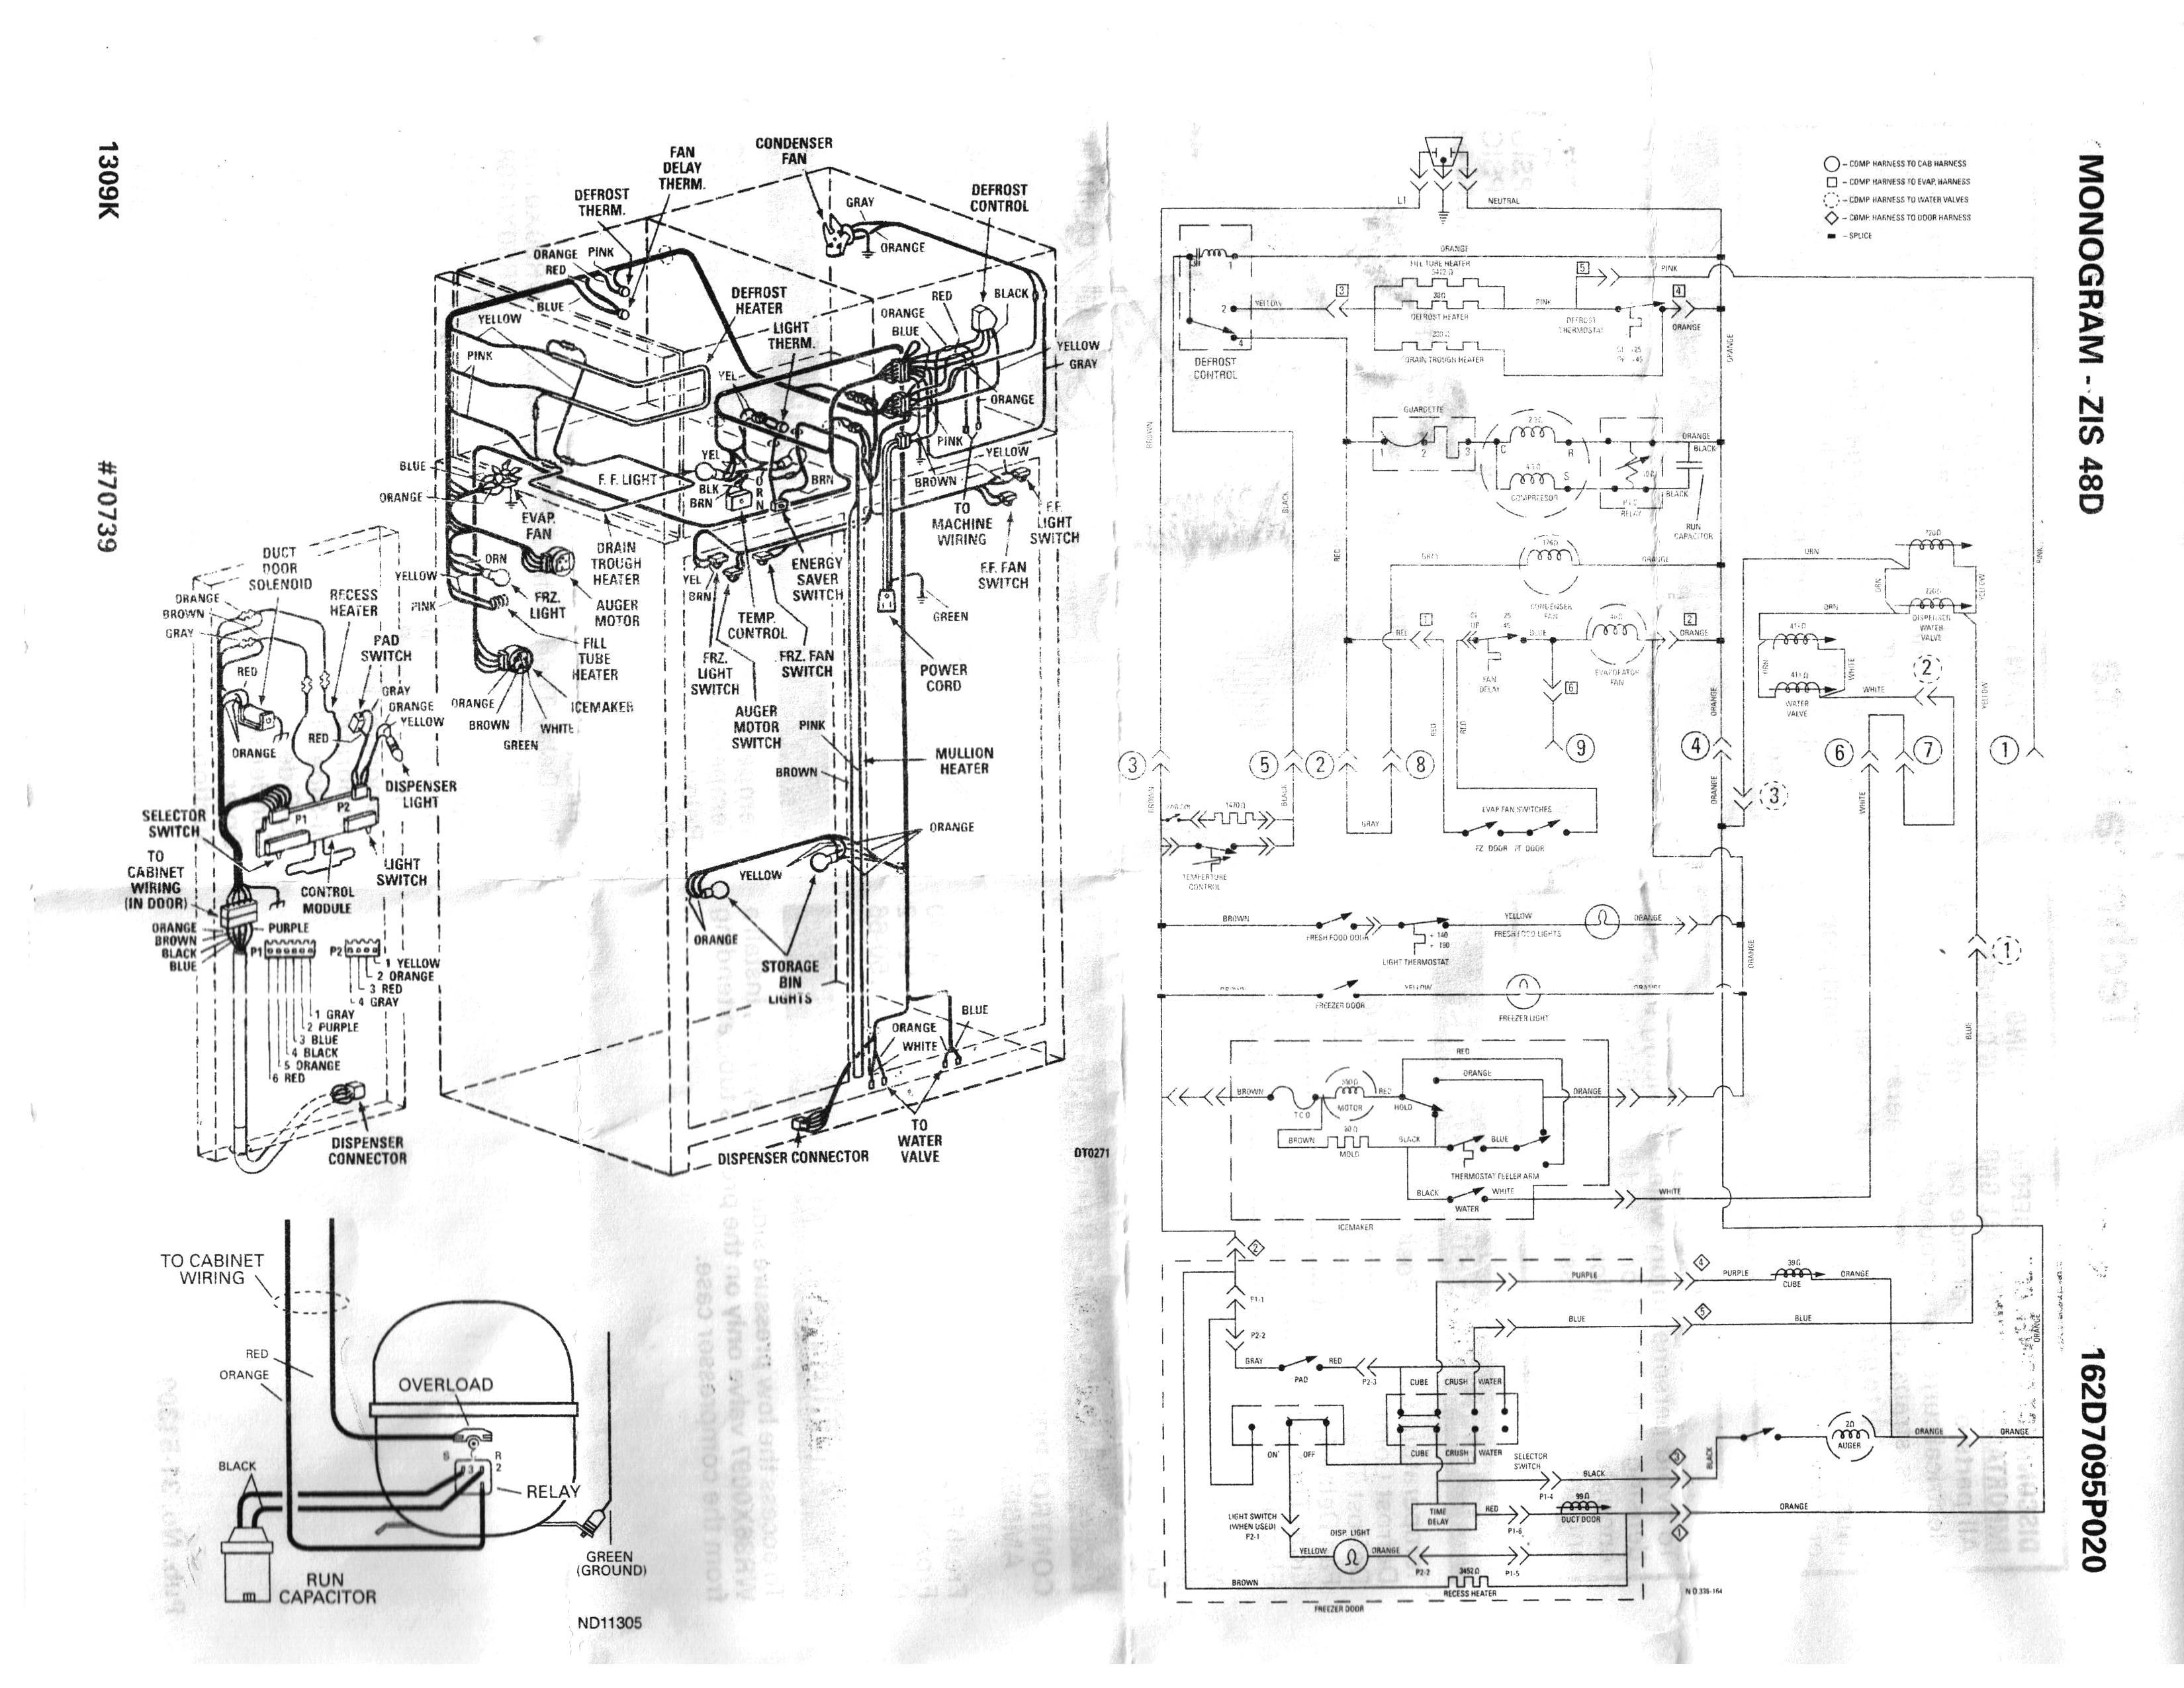 Ge Side by Side Refrigerator Wiring Diagram Ge Freezer Schematic Wiring  Diagram within Refrigerator Chunyan